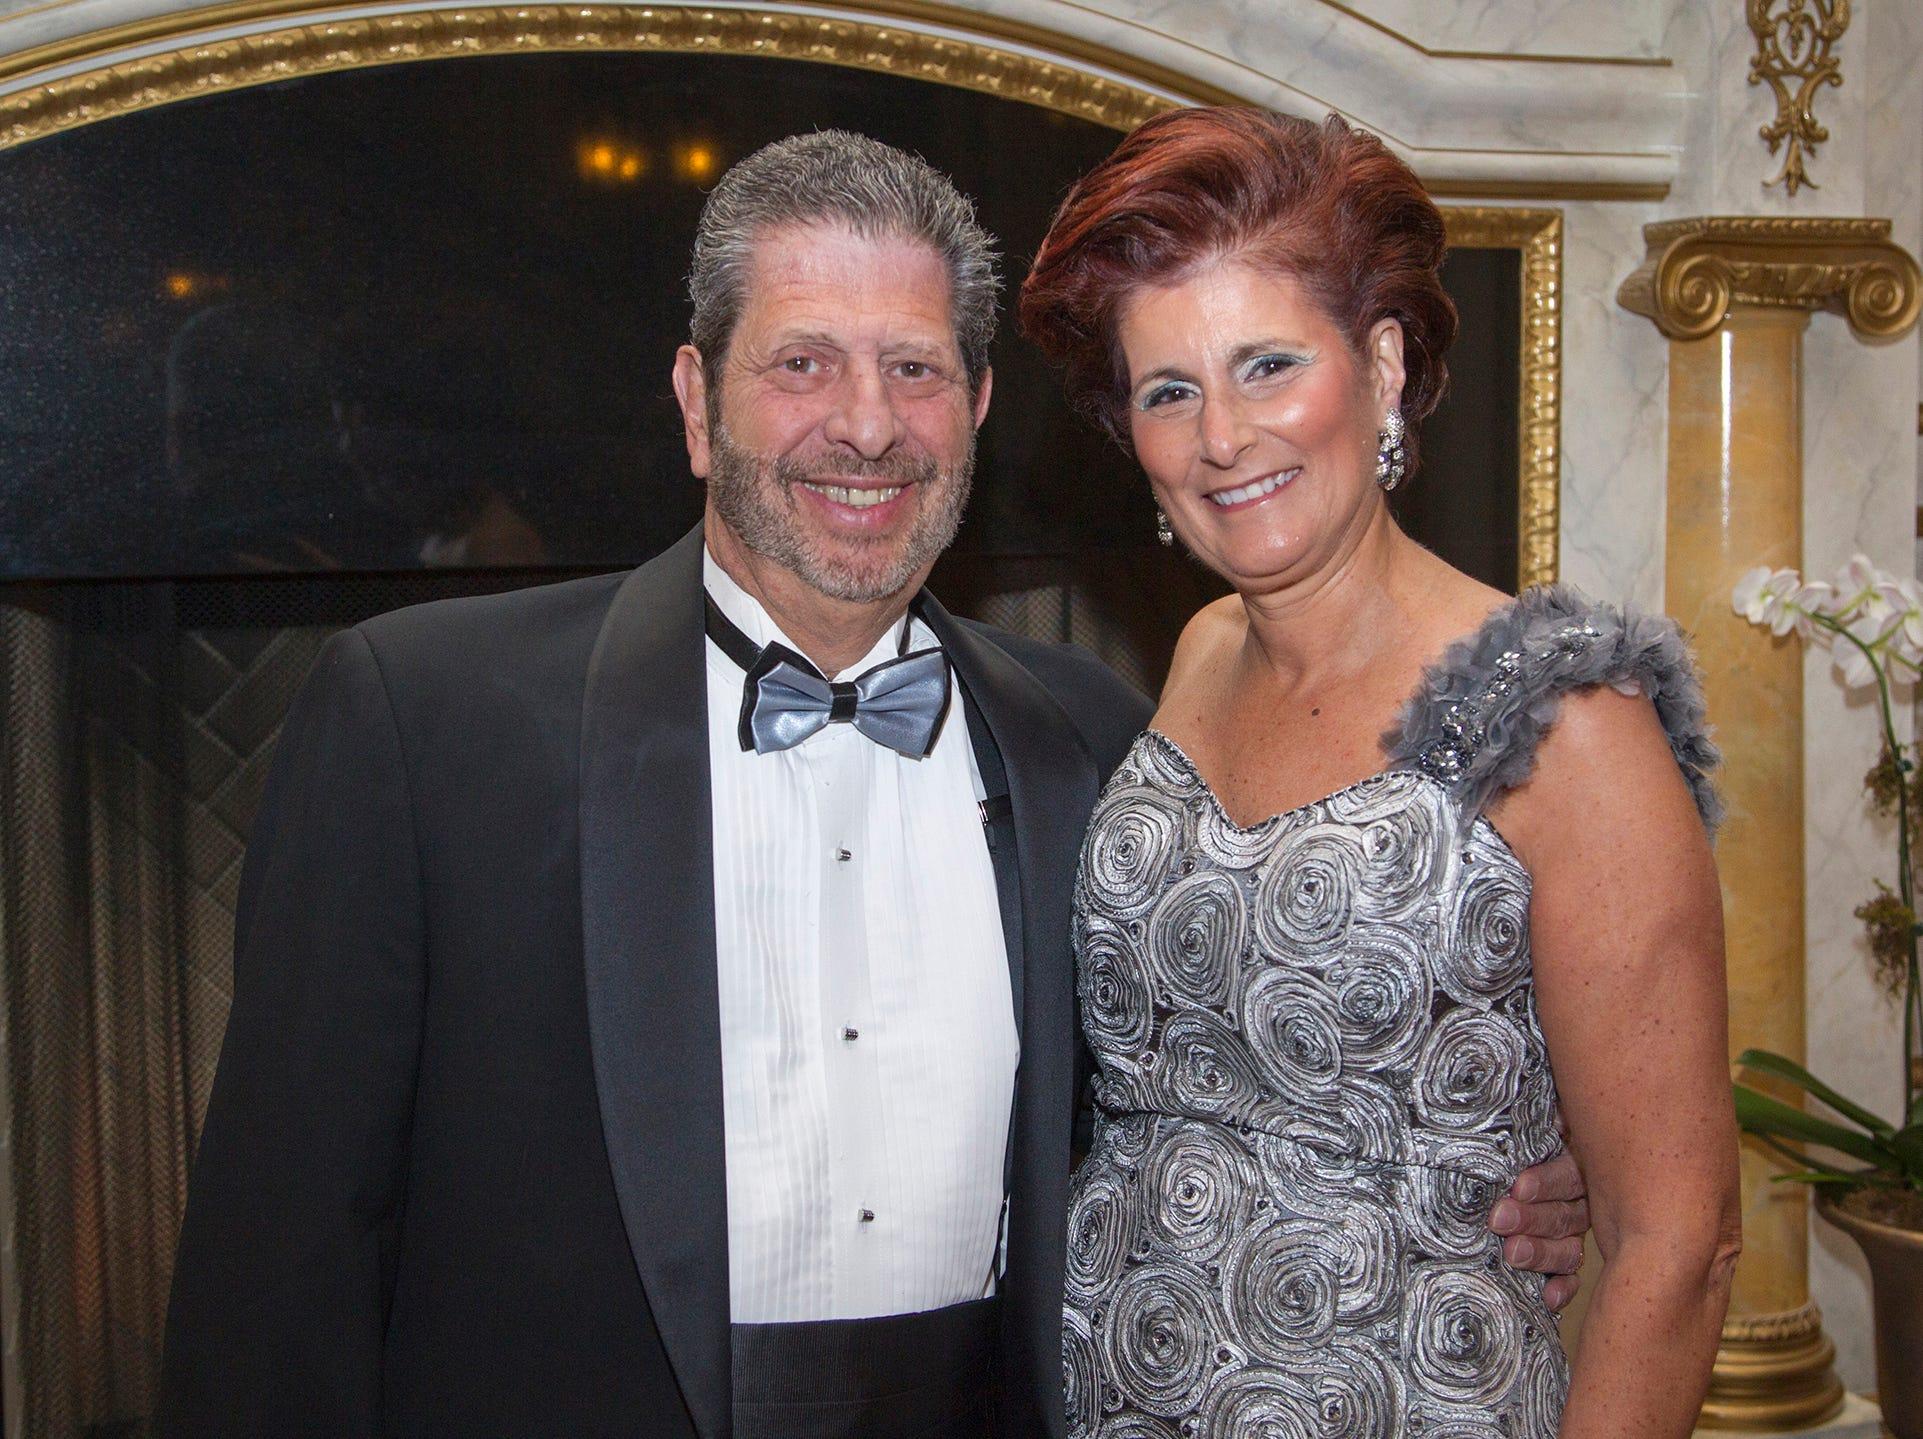 Joe Fragola, Marylynn Kearns. The 72nd Annual Valley Ball gala at The Legacy Castle in Pompton Plains. 11/16/2018